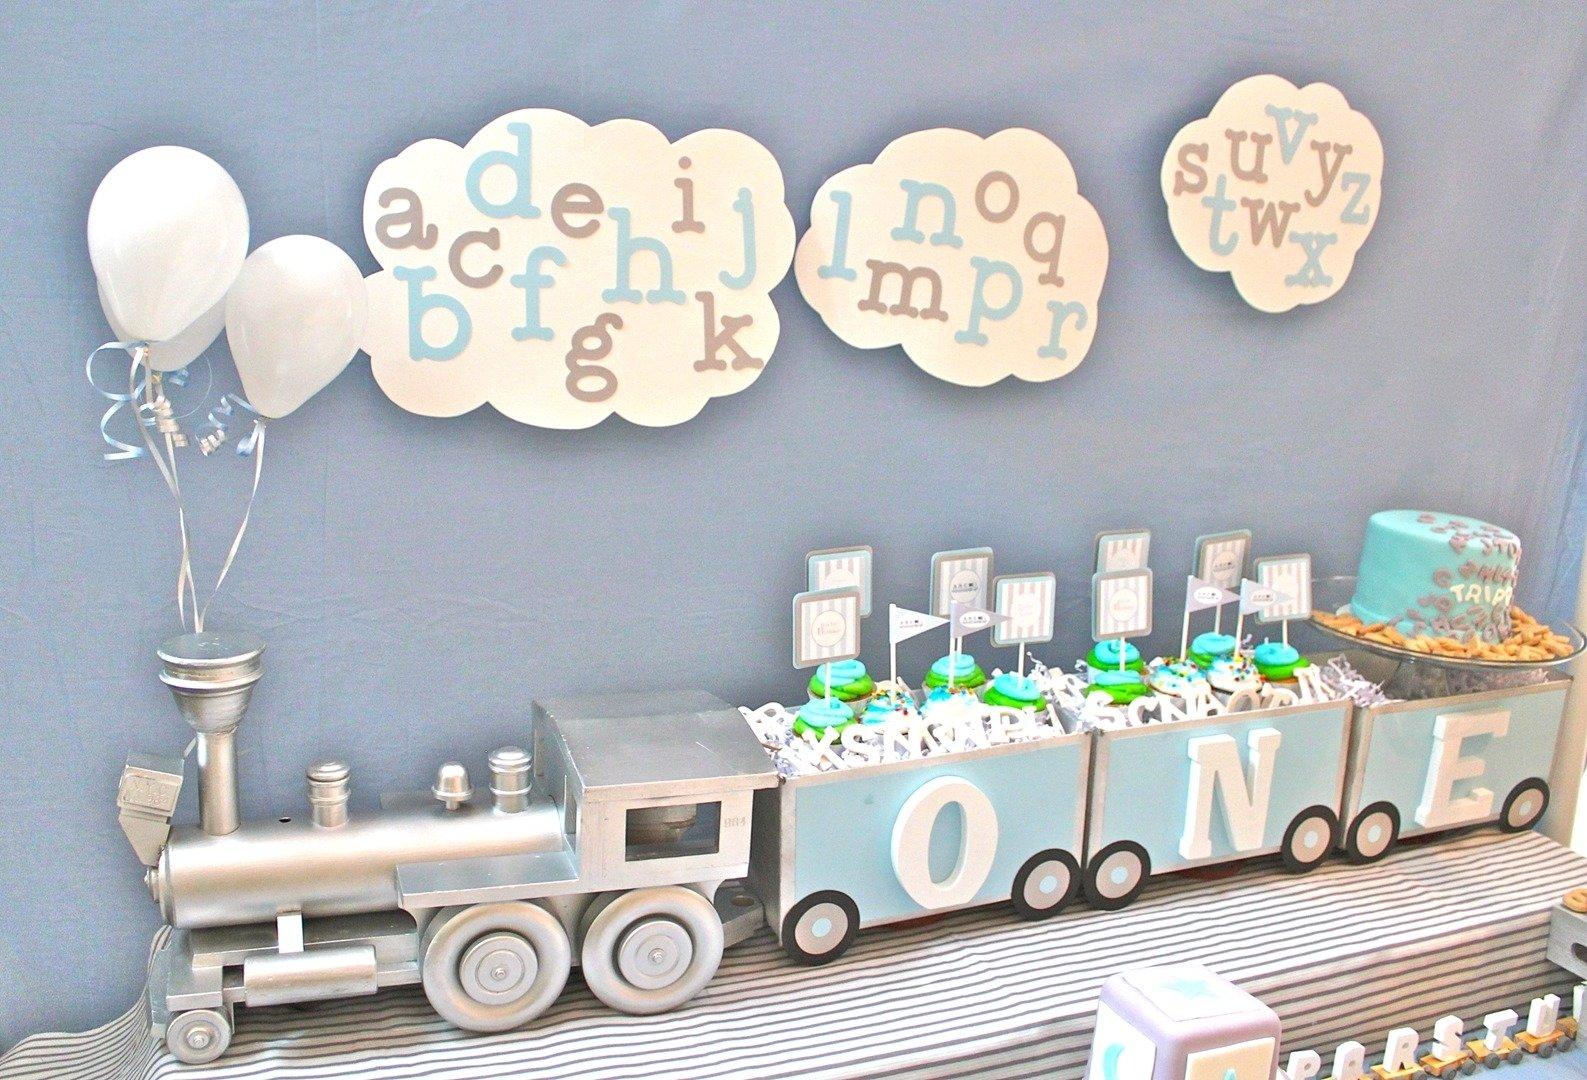 10 Fashionable 1St Boy Birthday Party Ideas cute boy birthday party themes dma homes 73258 2020